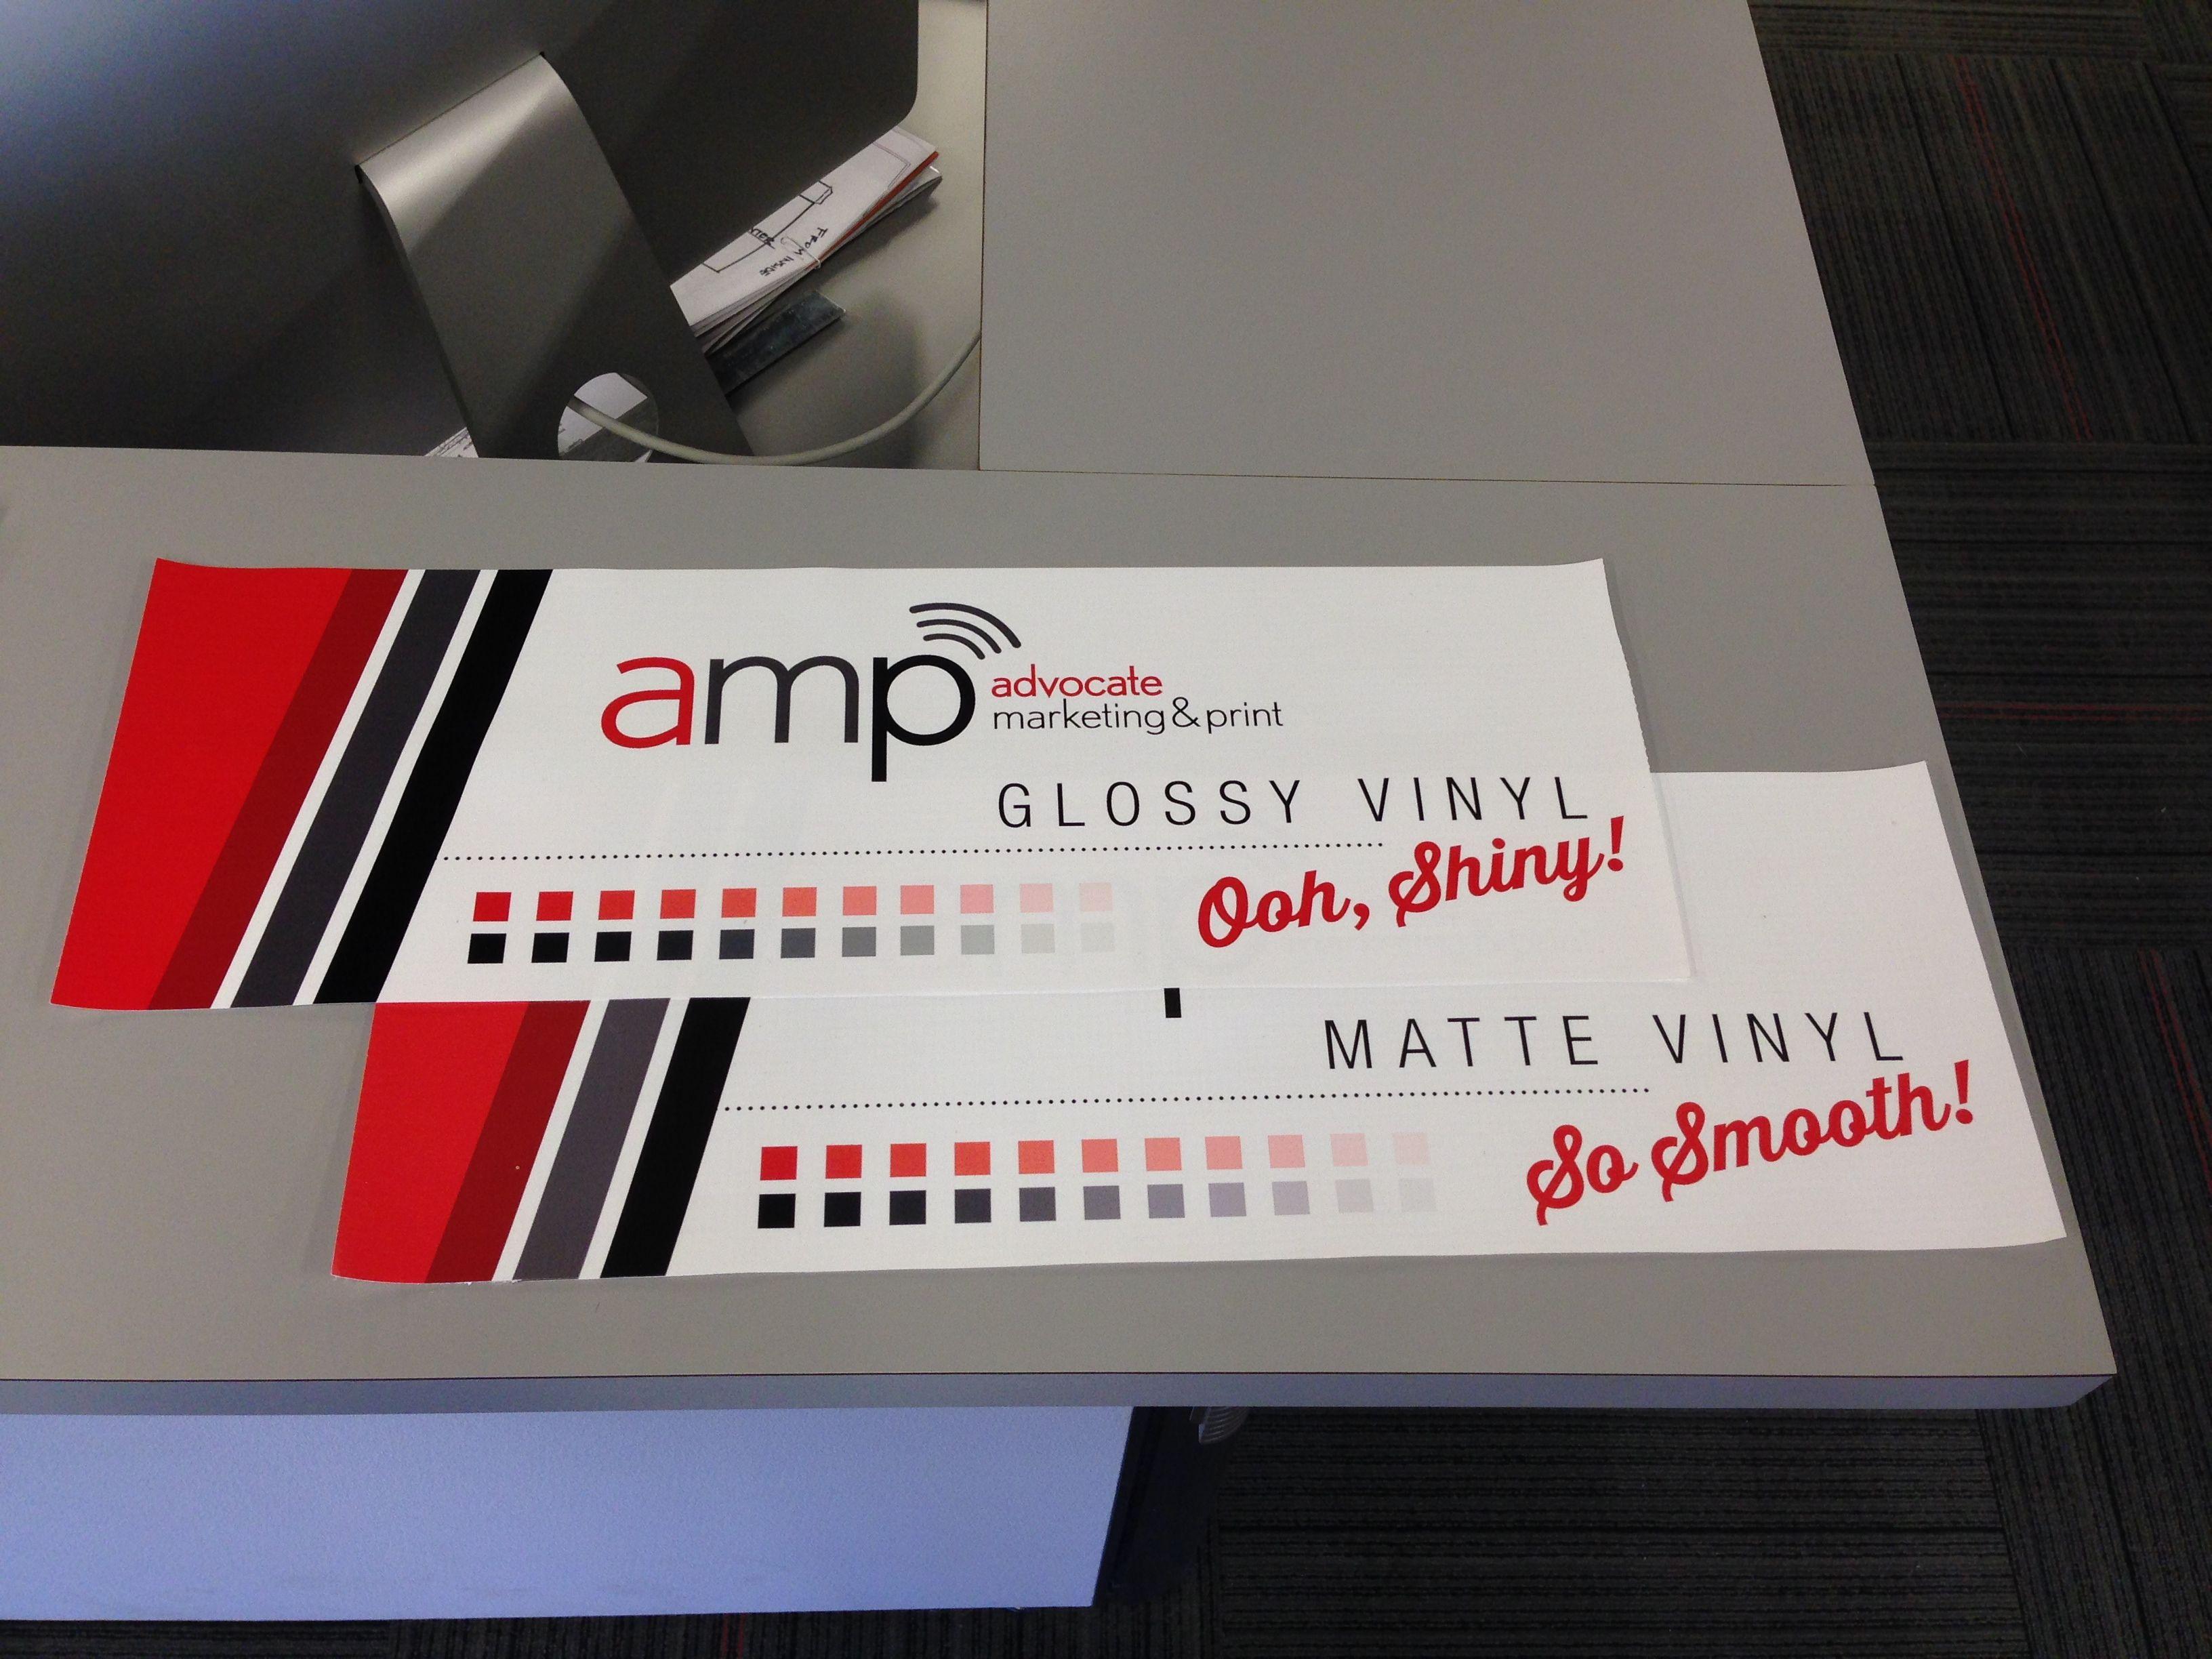 Glossy Vinyl And Matte Vinyl Banner Samples Banner Sample Printing Companies Graphic Design